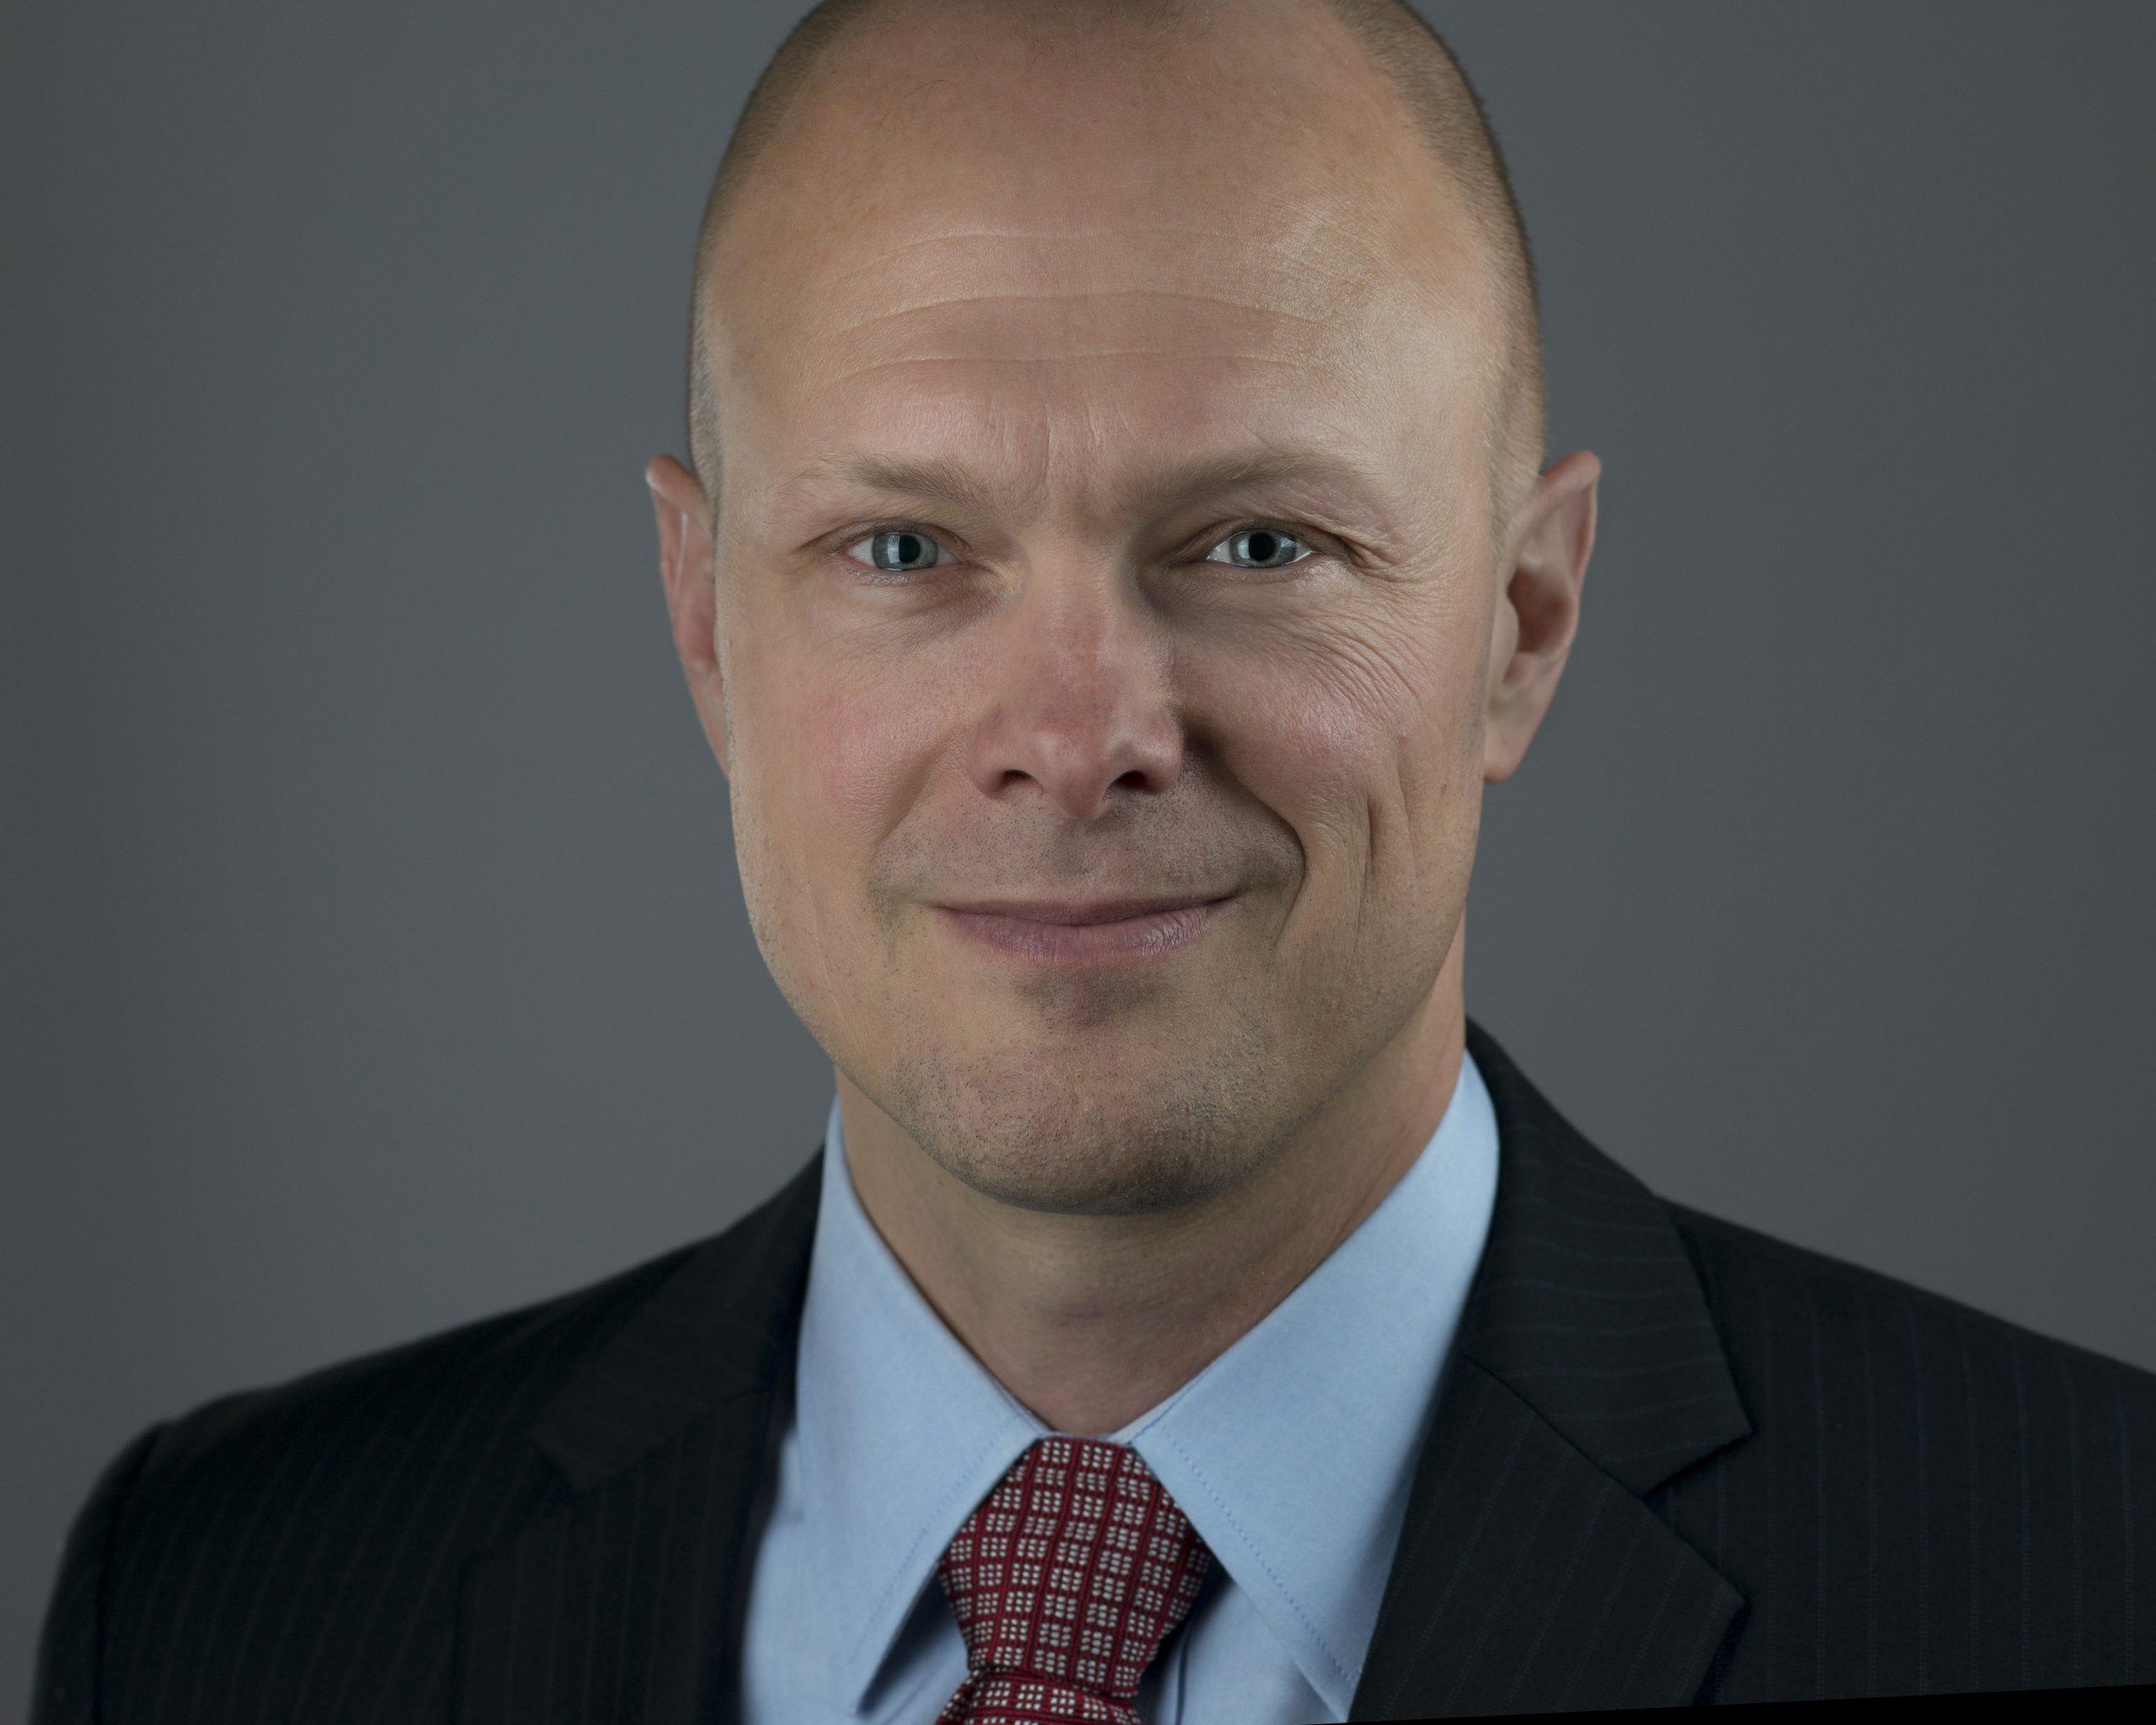 minneapolis business corporate headshot photographer